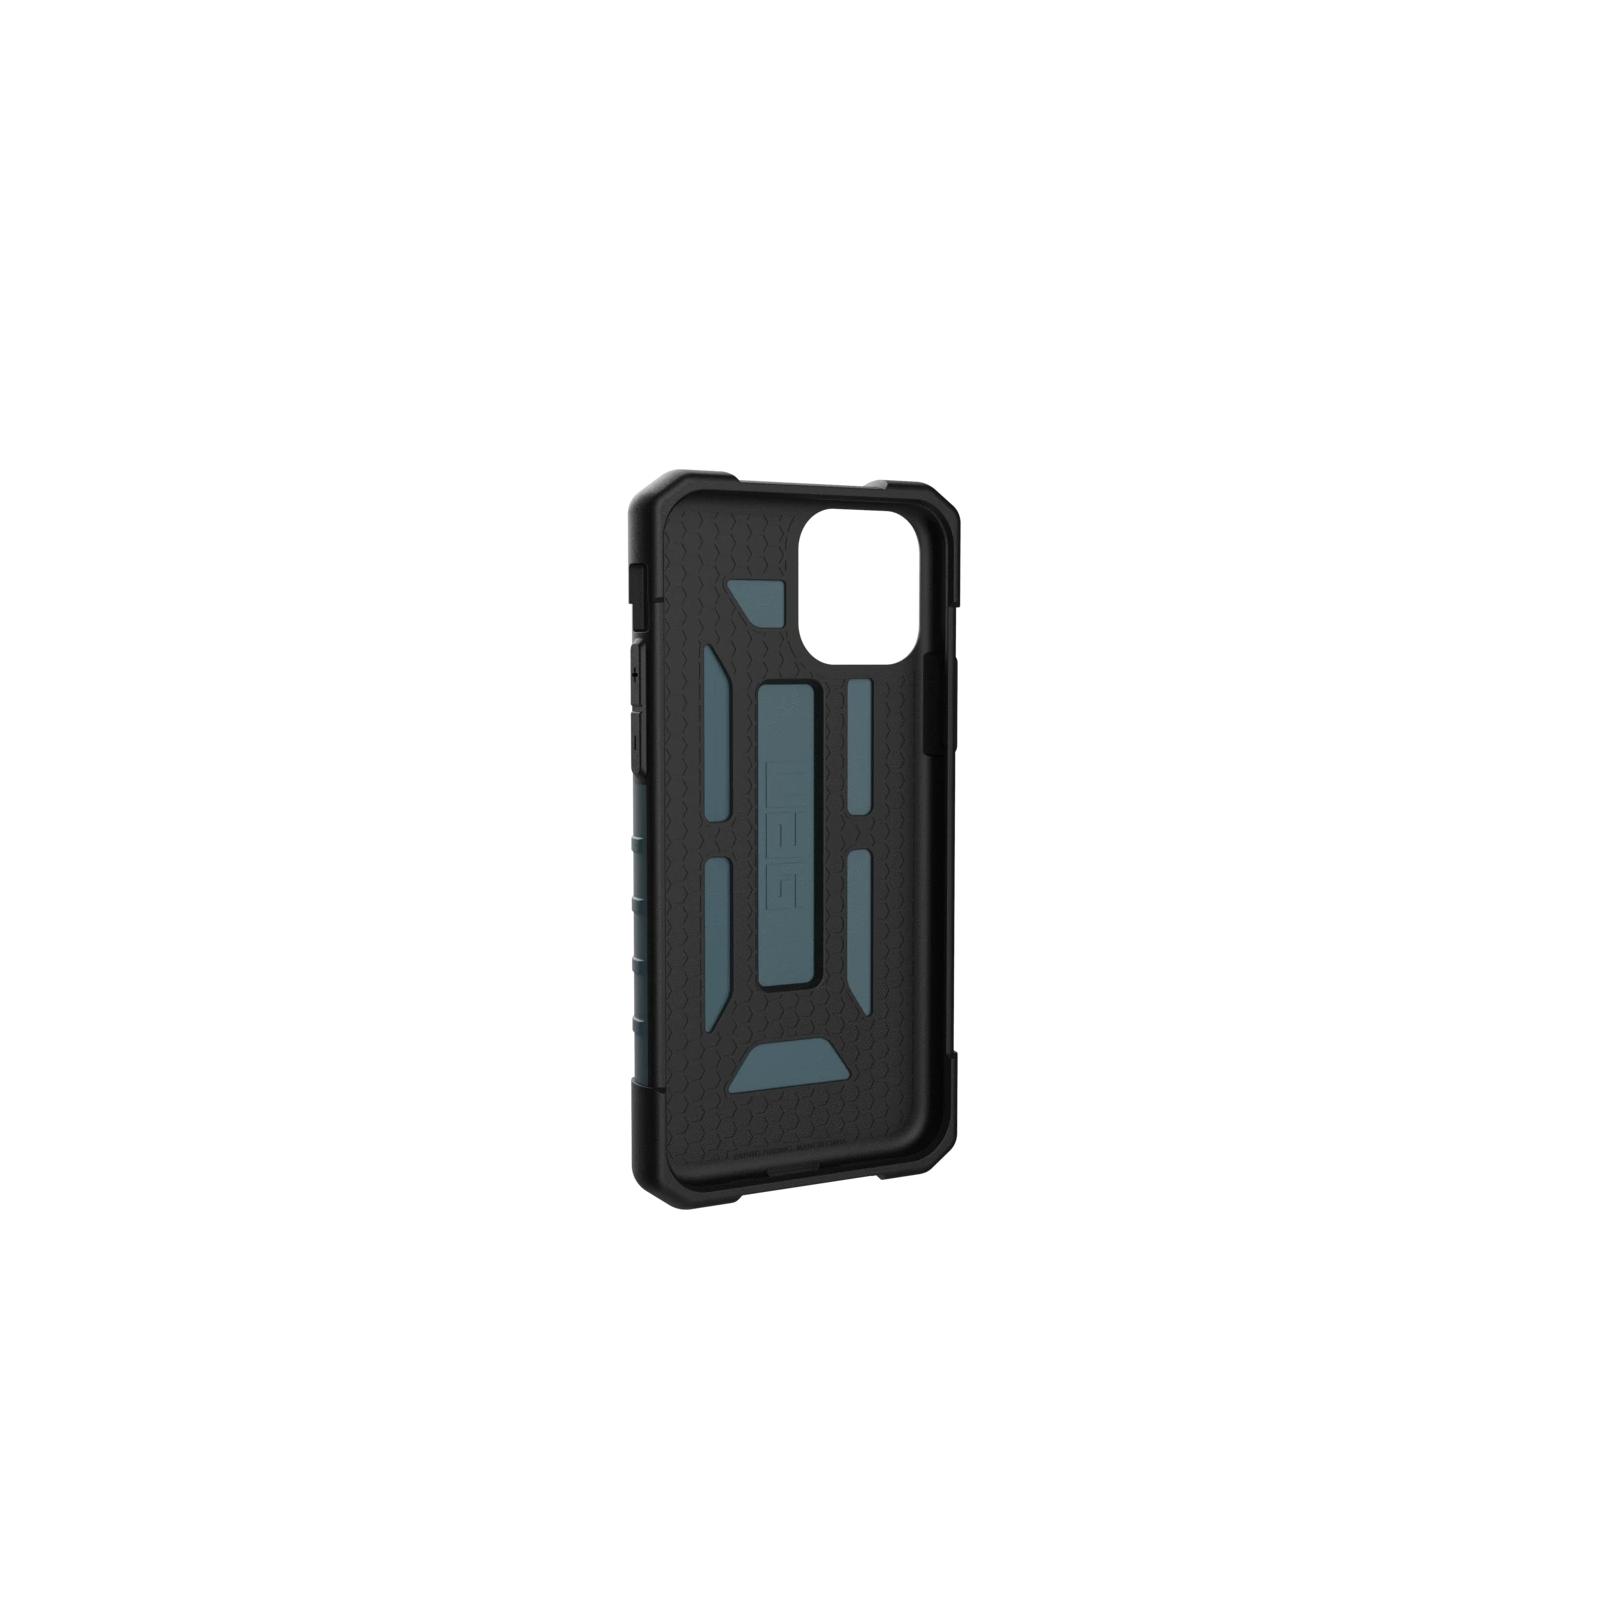 Чехол для моб. телефона Uag iPhone 11 Pro Pathfinder, White (111707114141) изображение 5